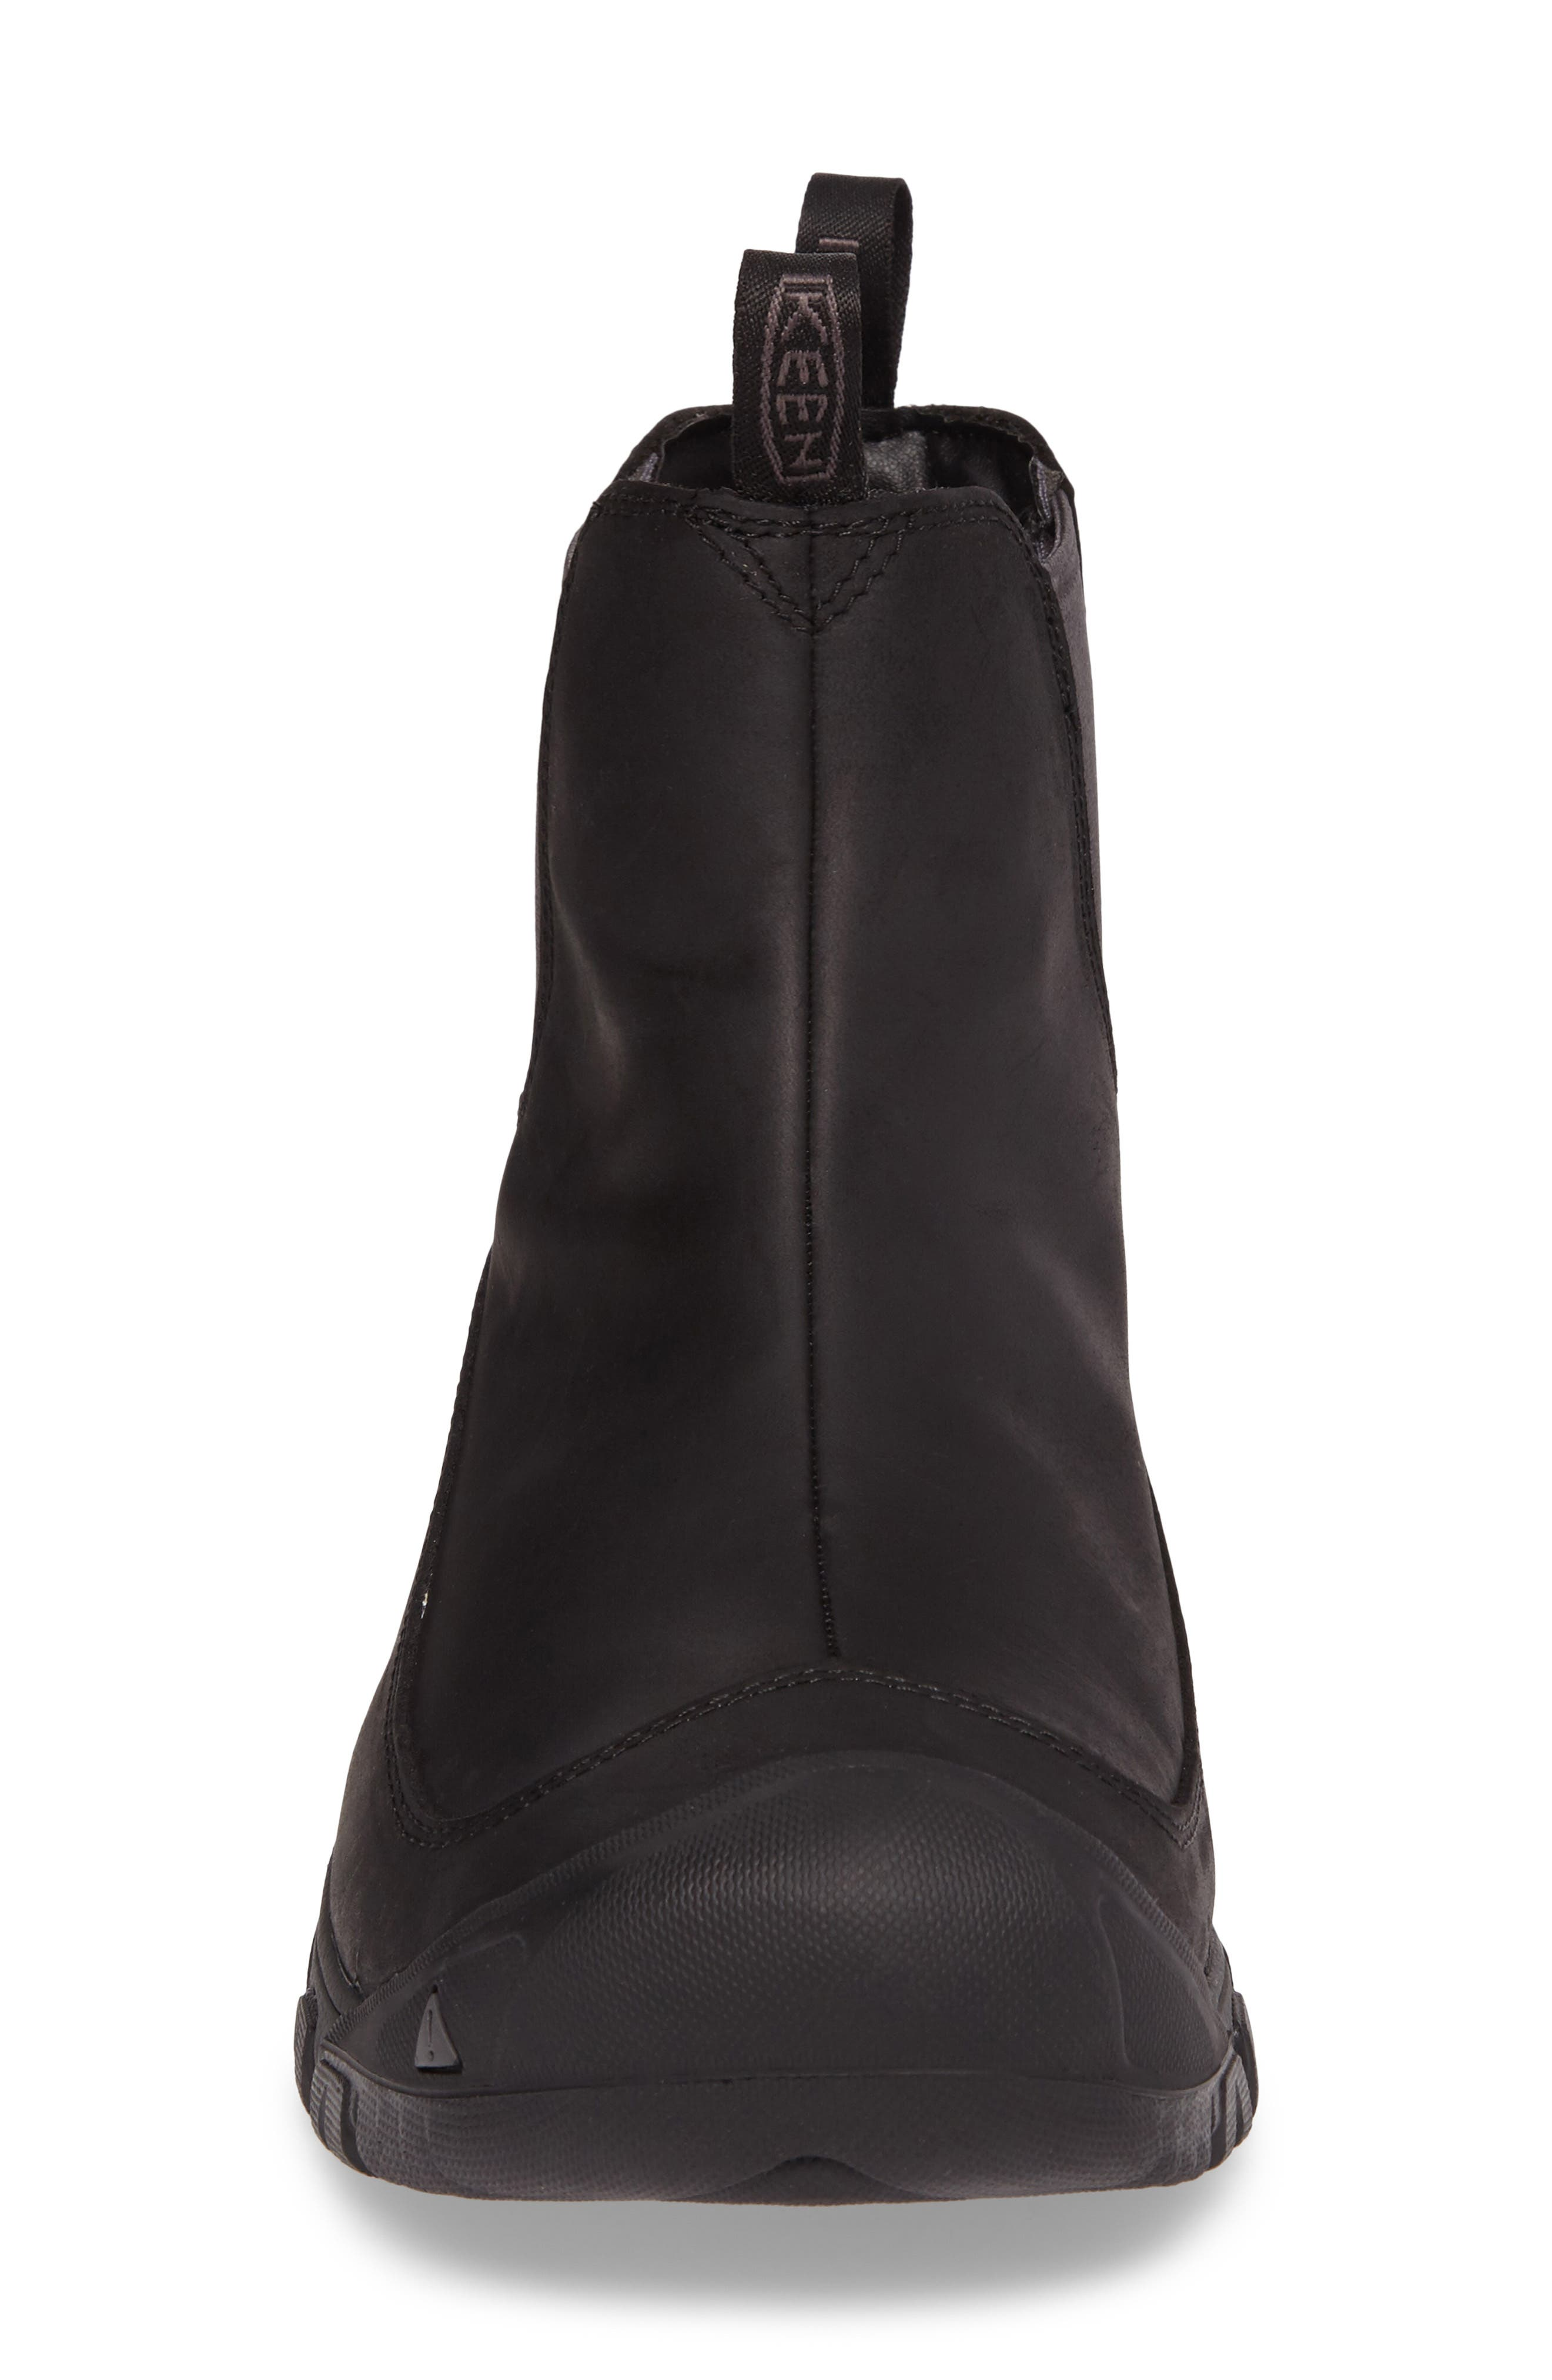 KEEN, Anchorage II Waterproof Chelsea Boot, Alternate thumbnail 4, color, 001